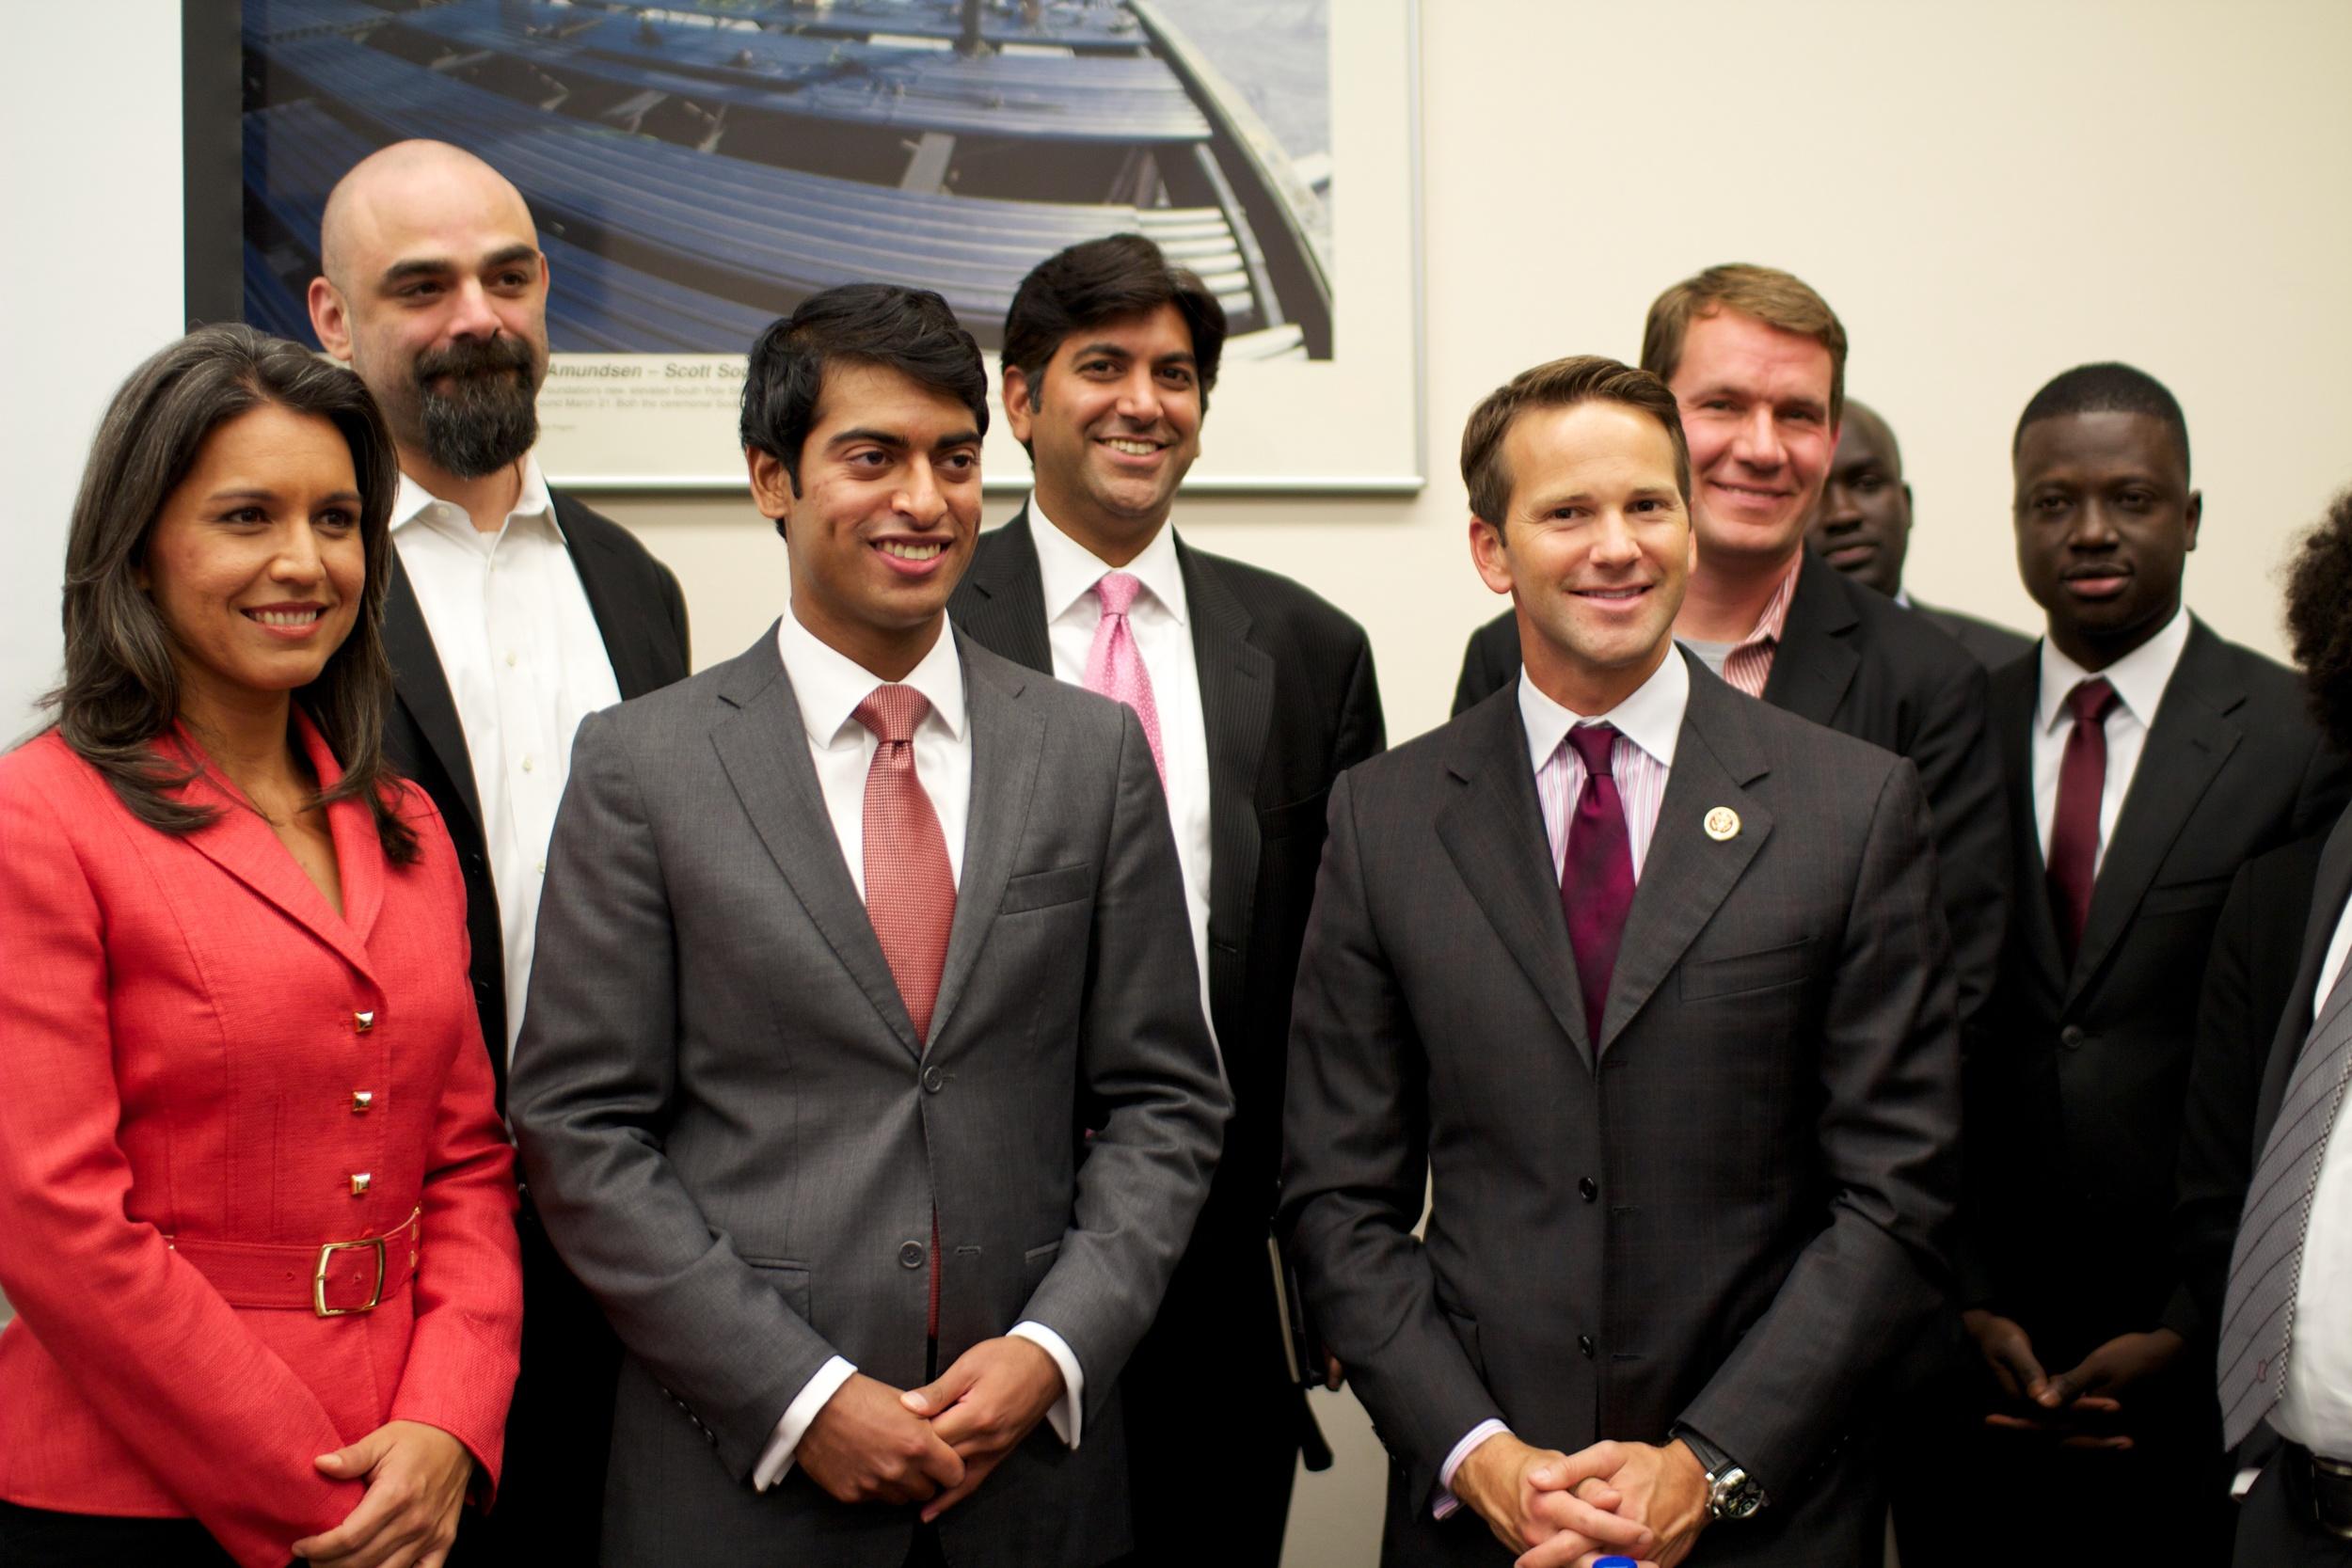 From left: Rep. Tulsi Gabbard (D-HI); John Stanton; Steven Olikara; Aneesh Chopra; Rep. Aaron Schock (R-IL); and Scott Case.